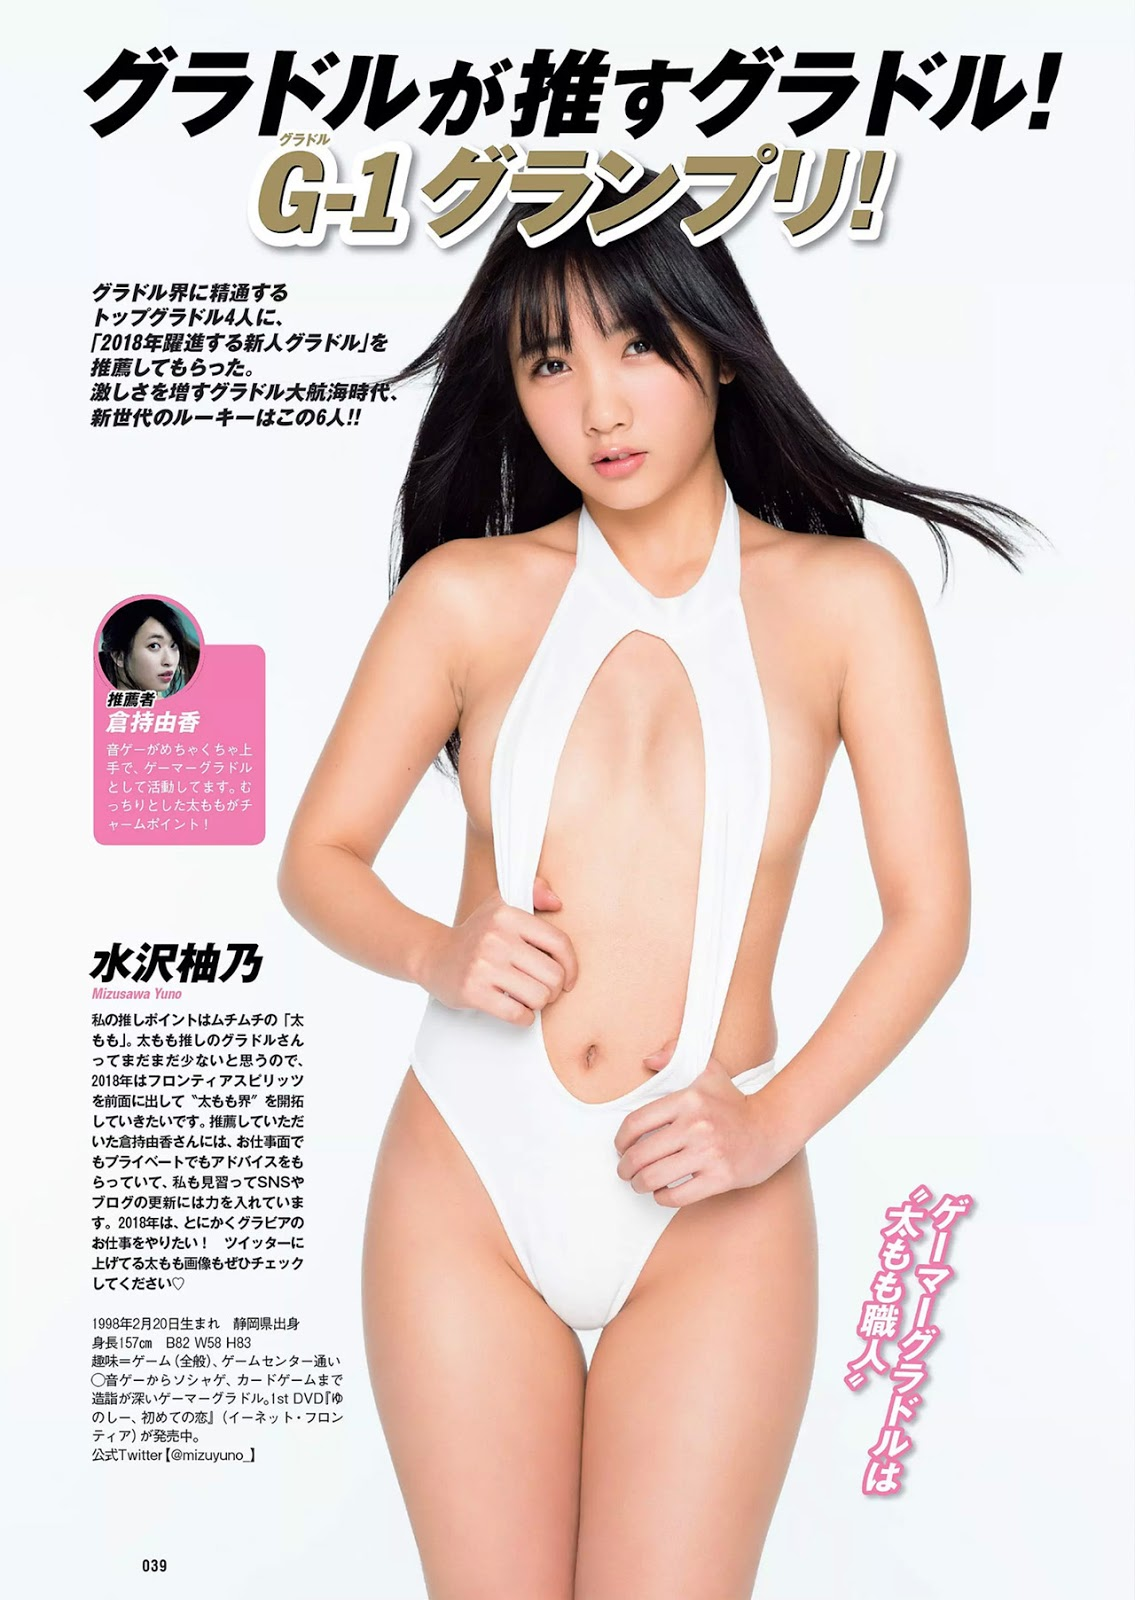 G-1 Grand Prix, Weekly Playboy 2018.01.08 No.01 (週刊プレイボーイ 2017年1月8日号)